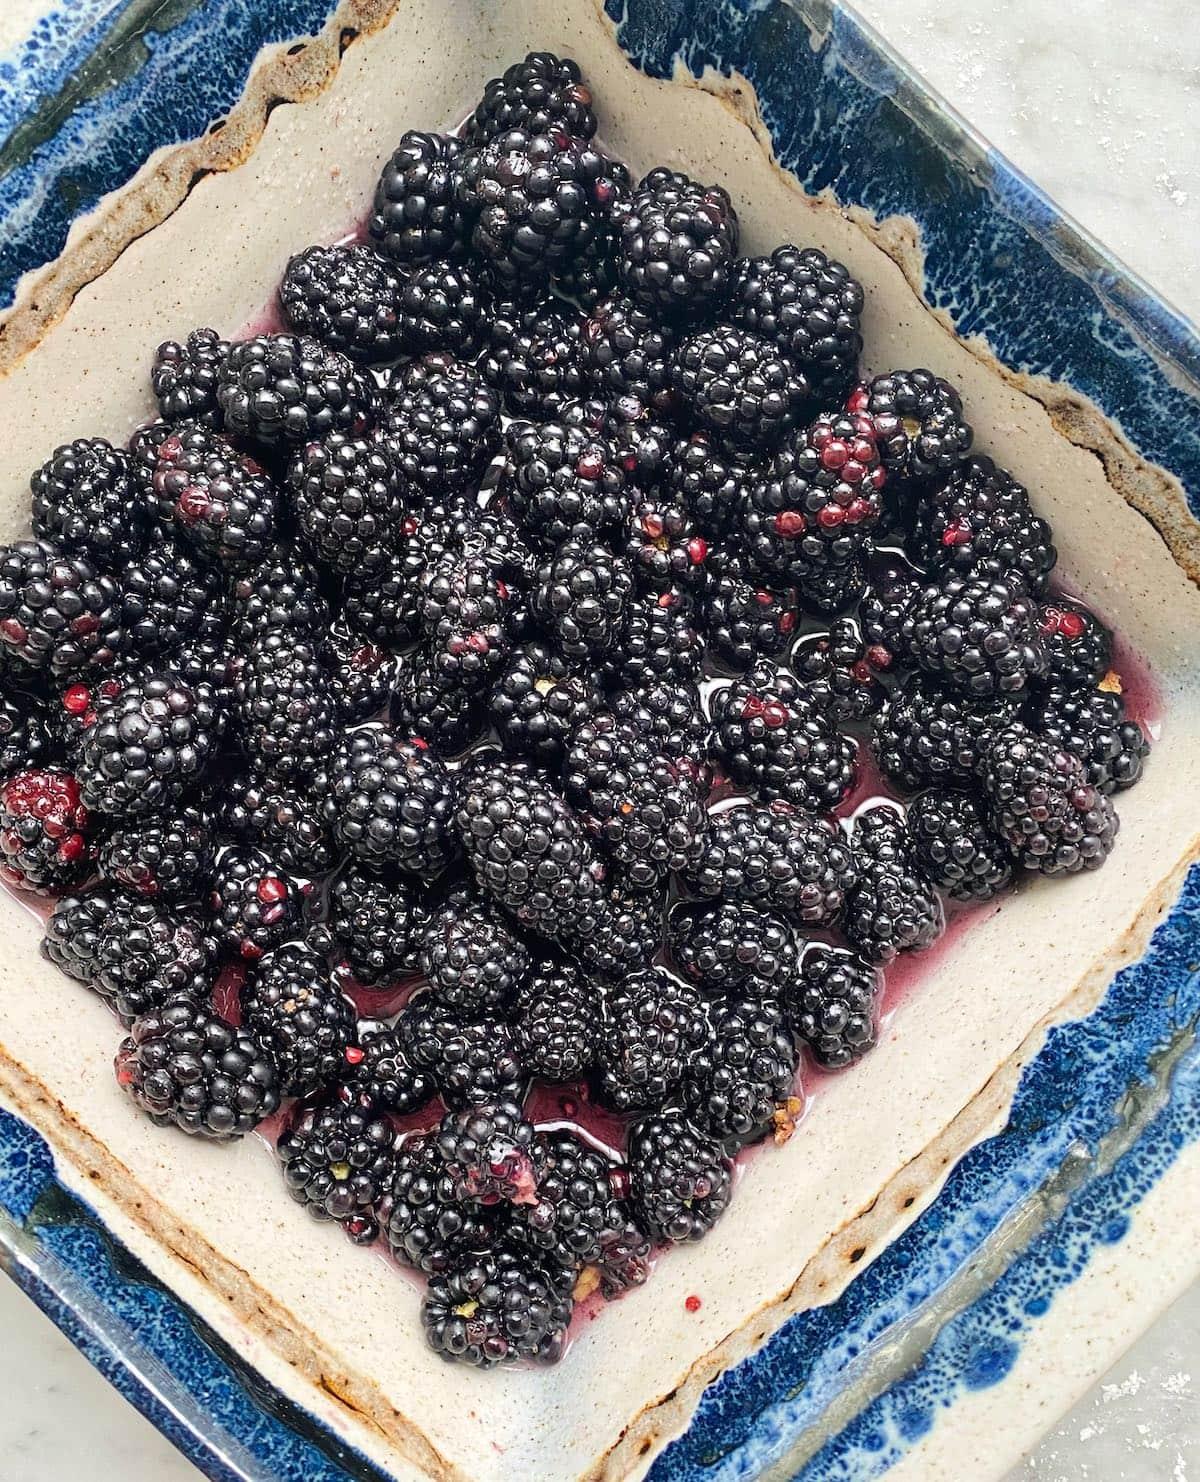 fresh blackberries in a blue dish.